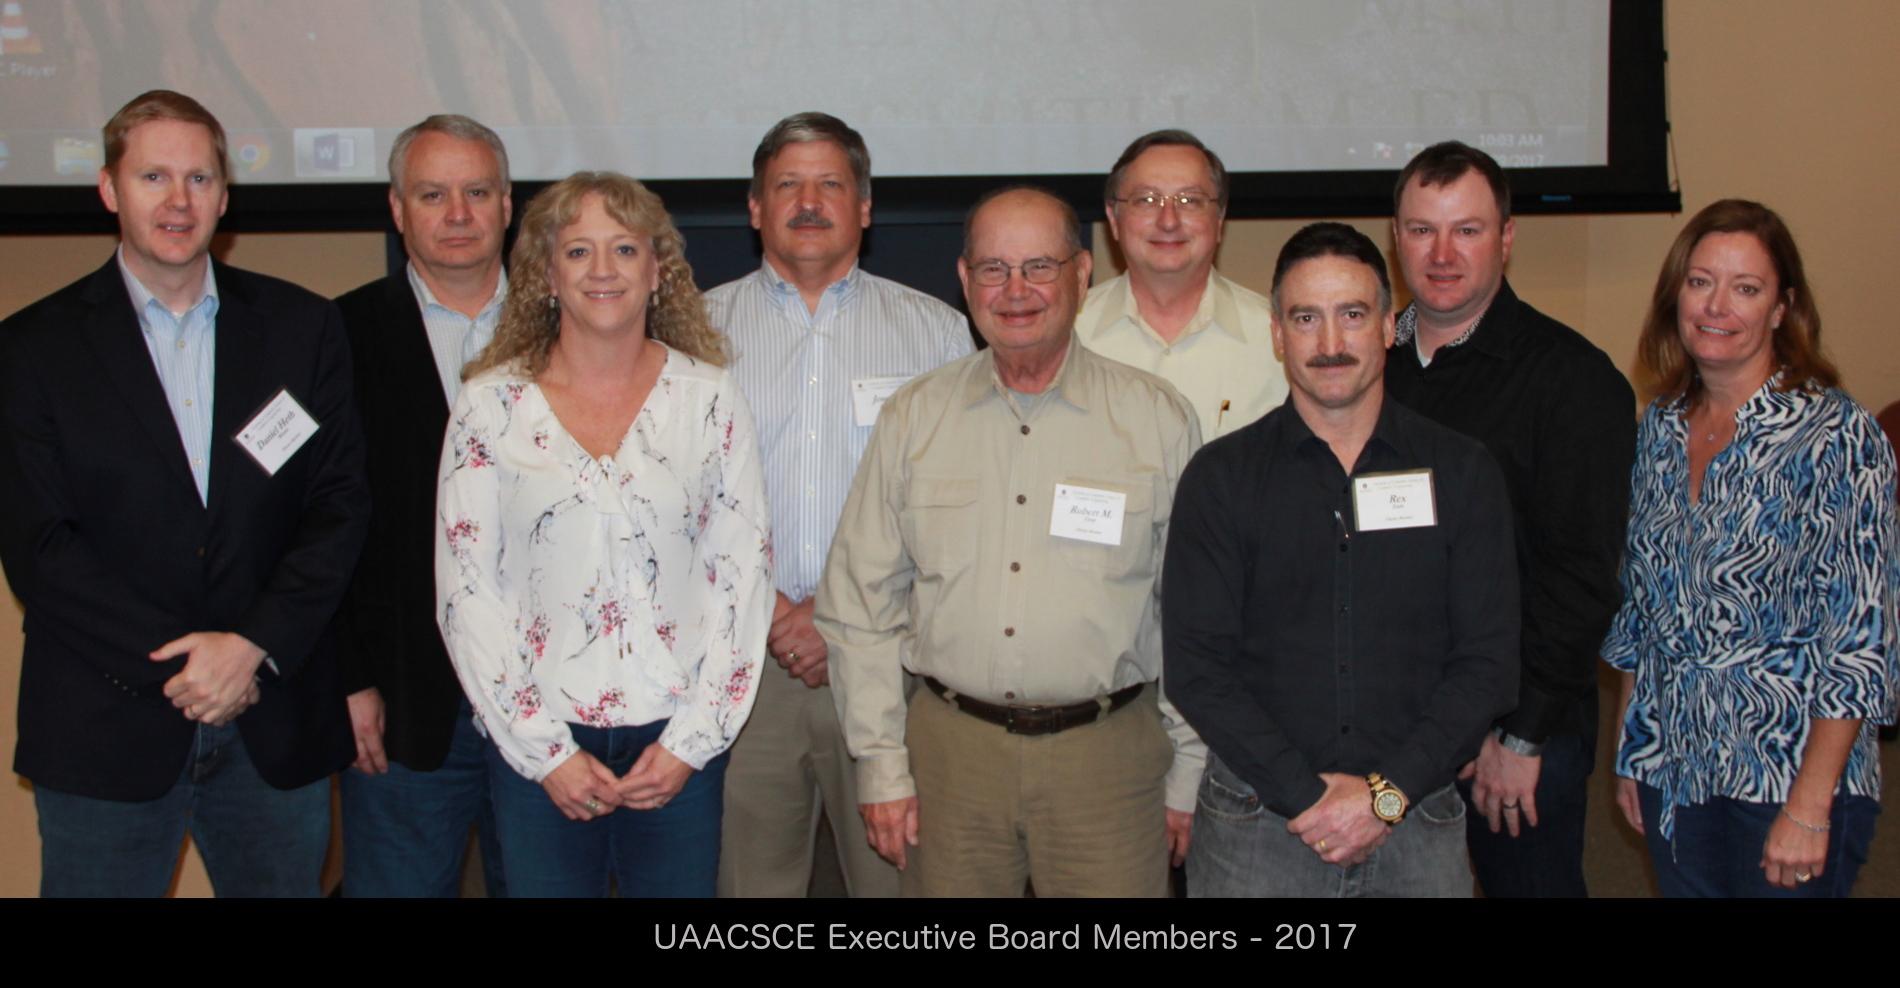 UAACSCE Executive Board